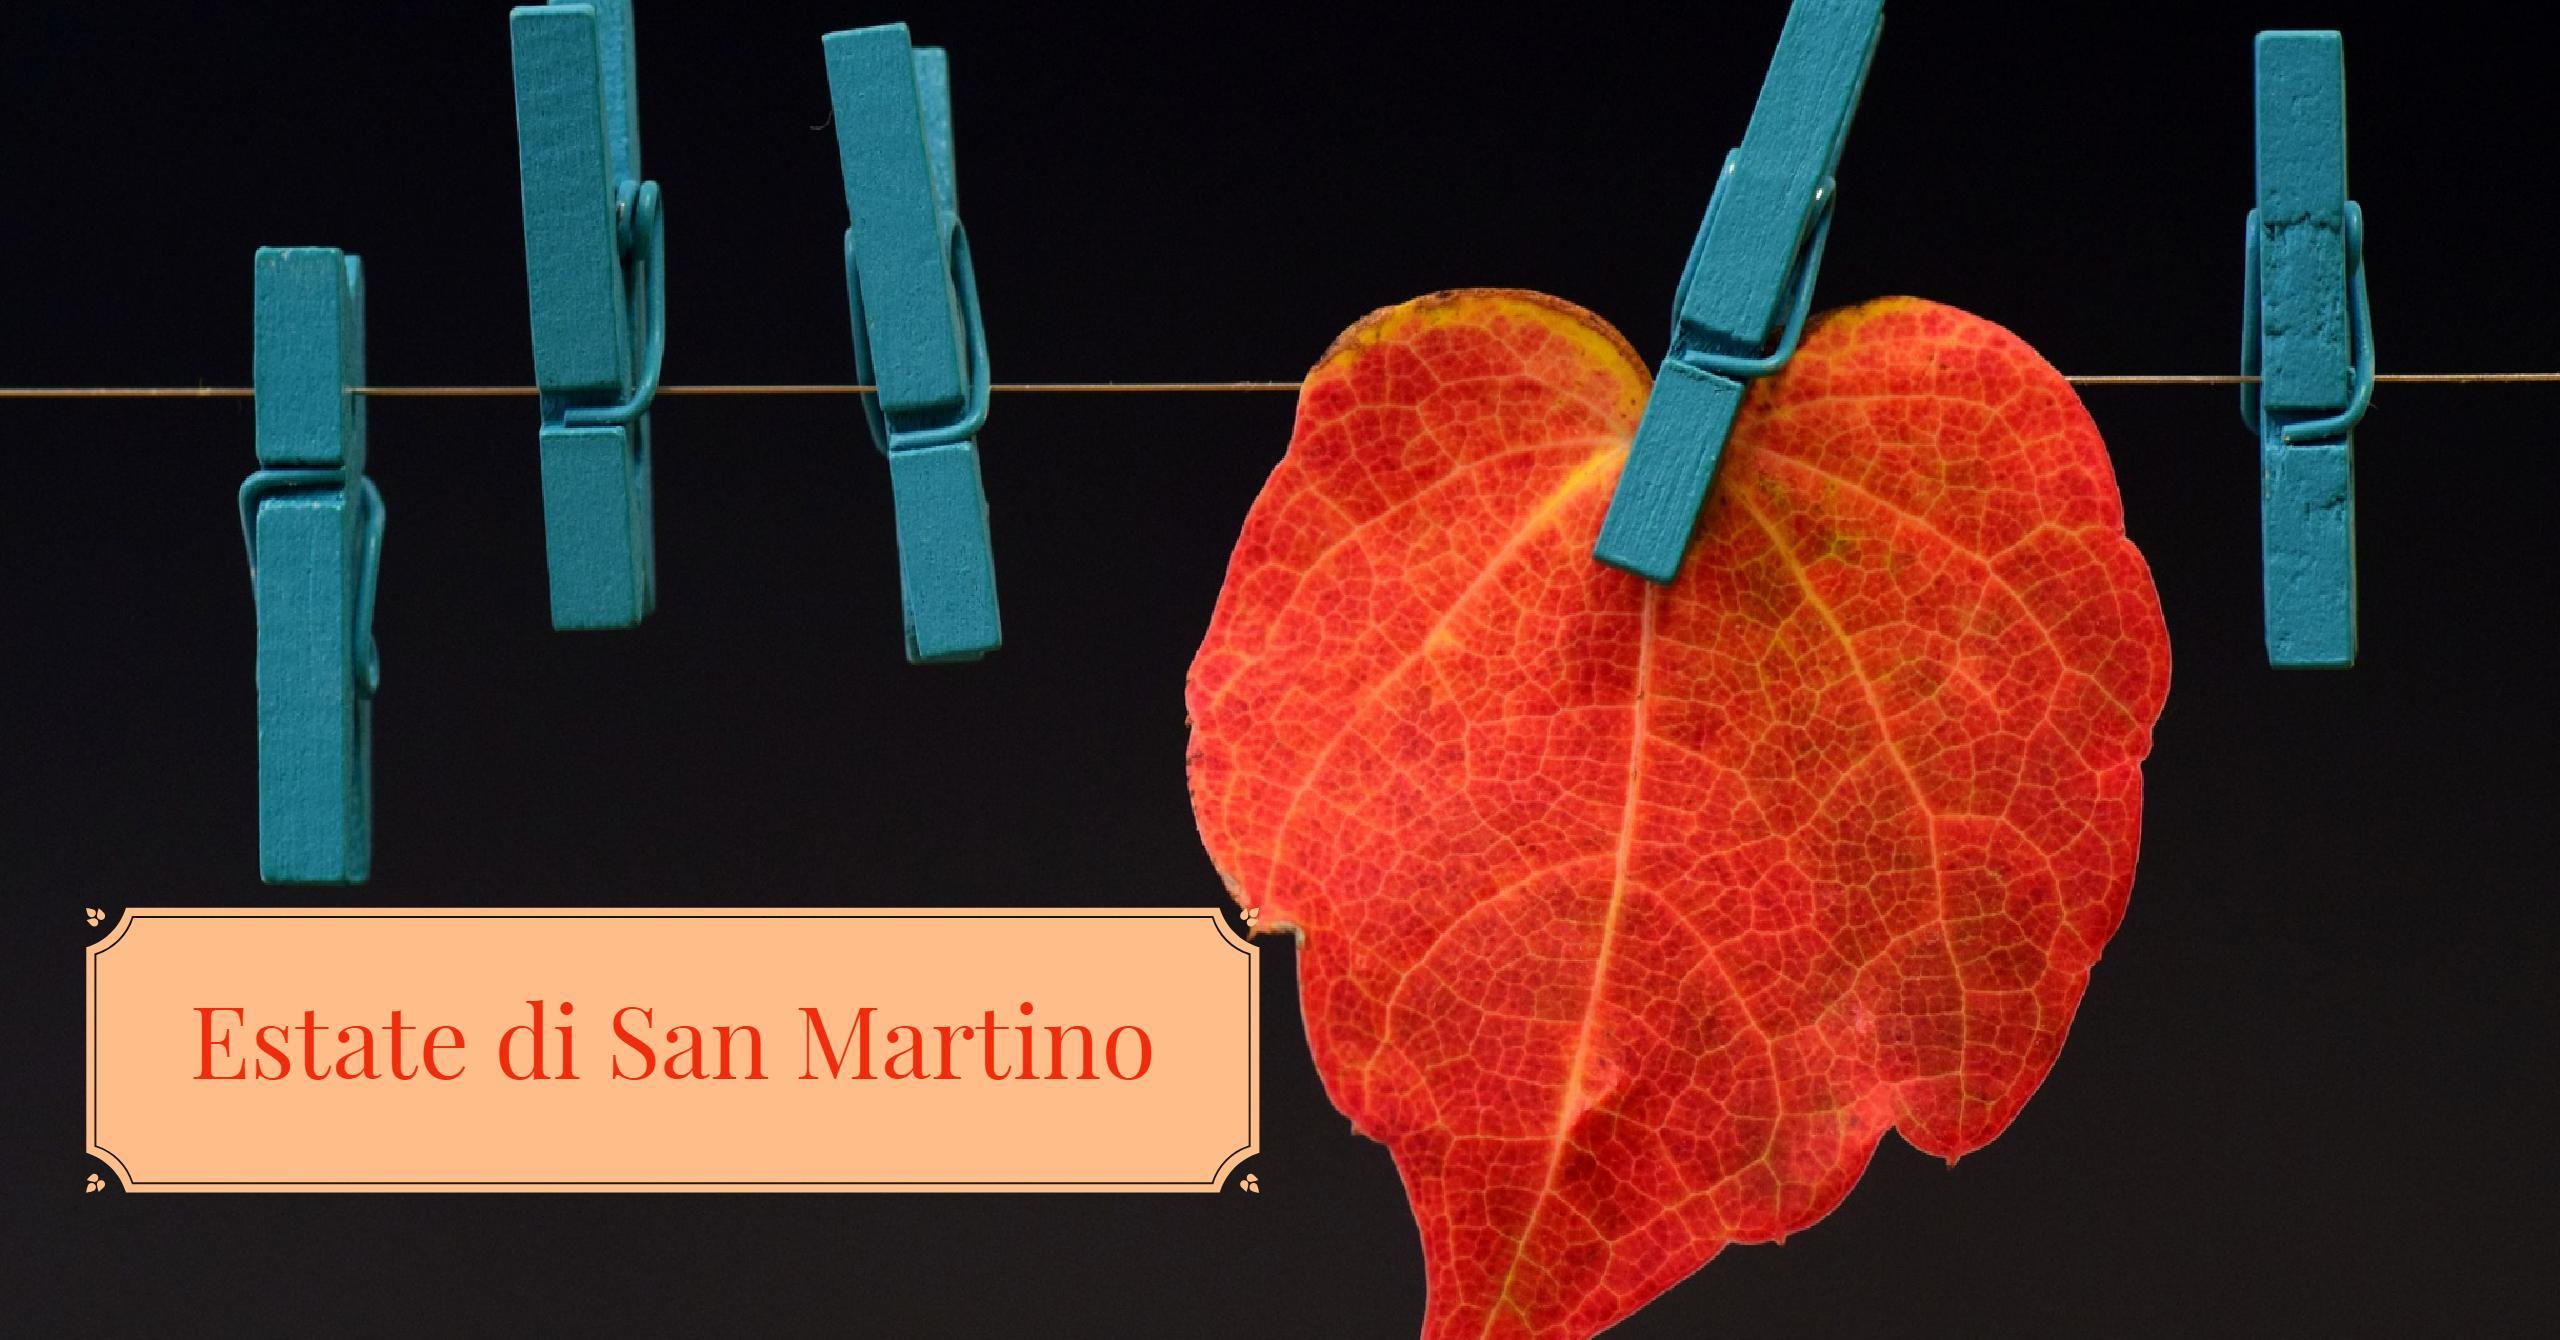 Estate di San Martino. Origini, usanze e curiosità.